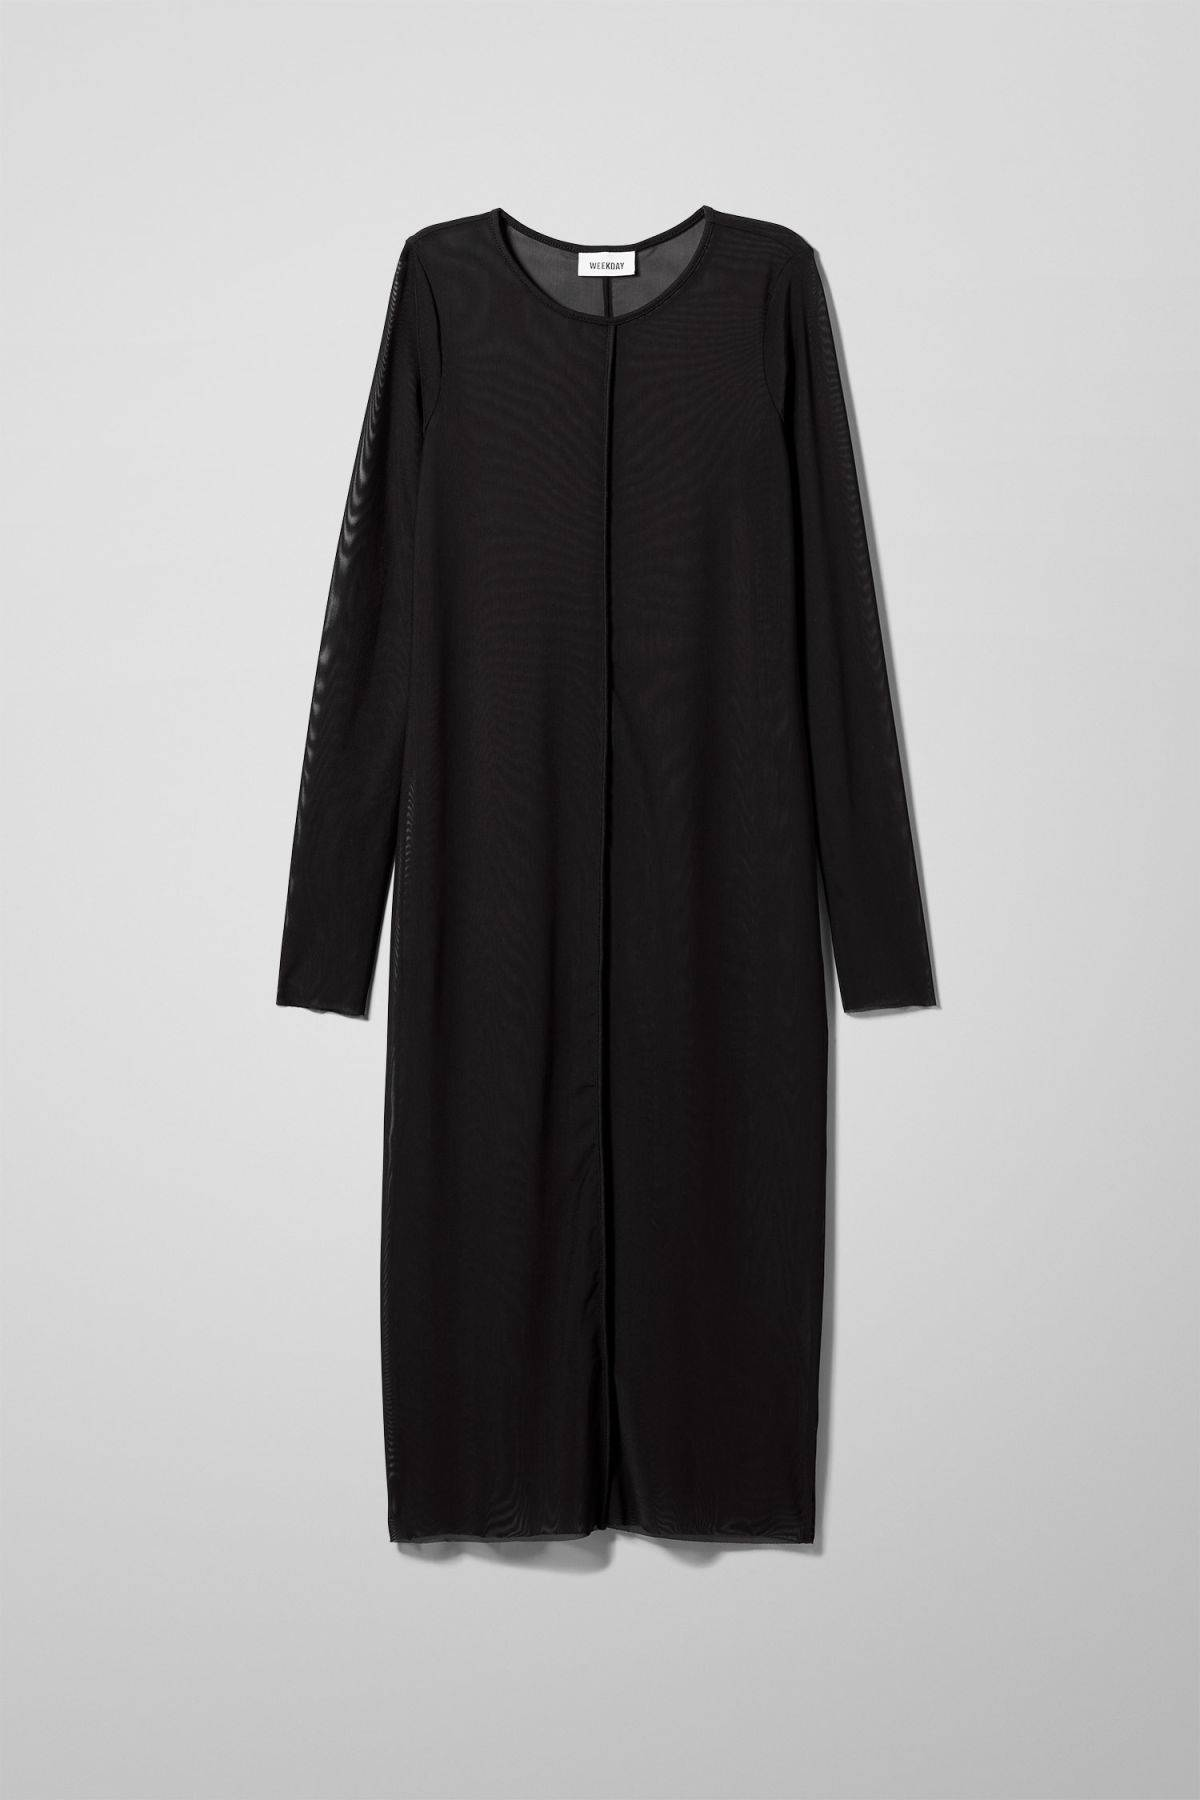 Image of Emelie Mesh Dress - Black-XS